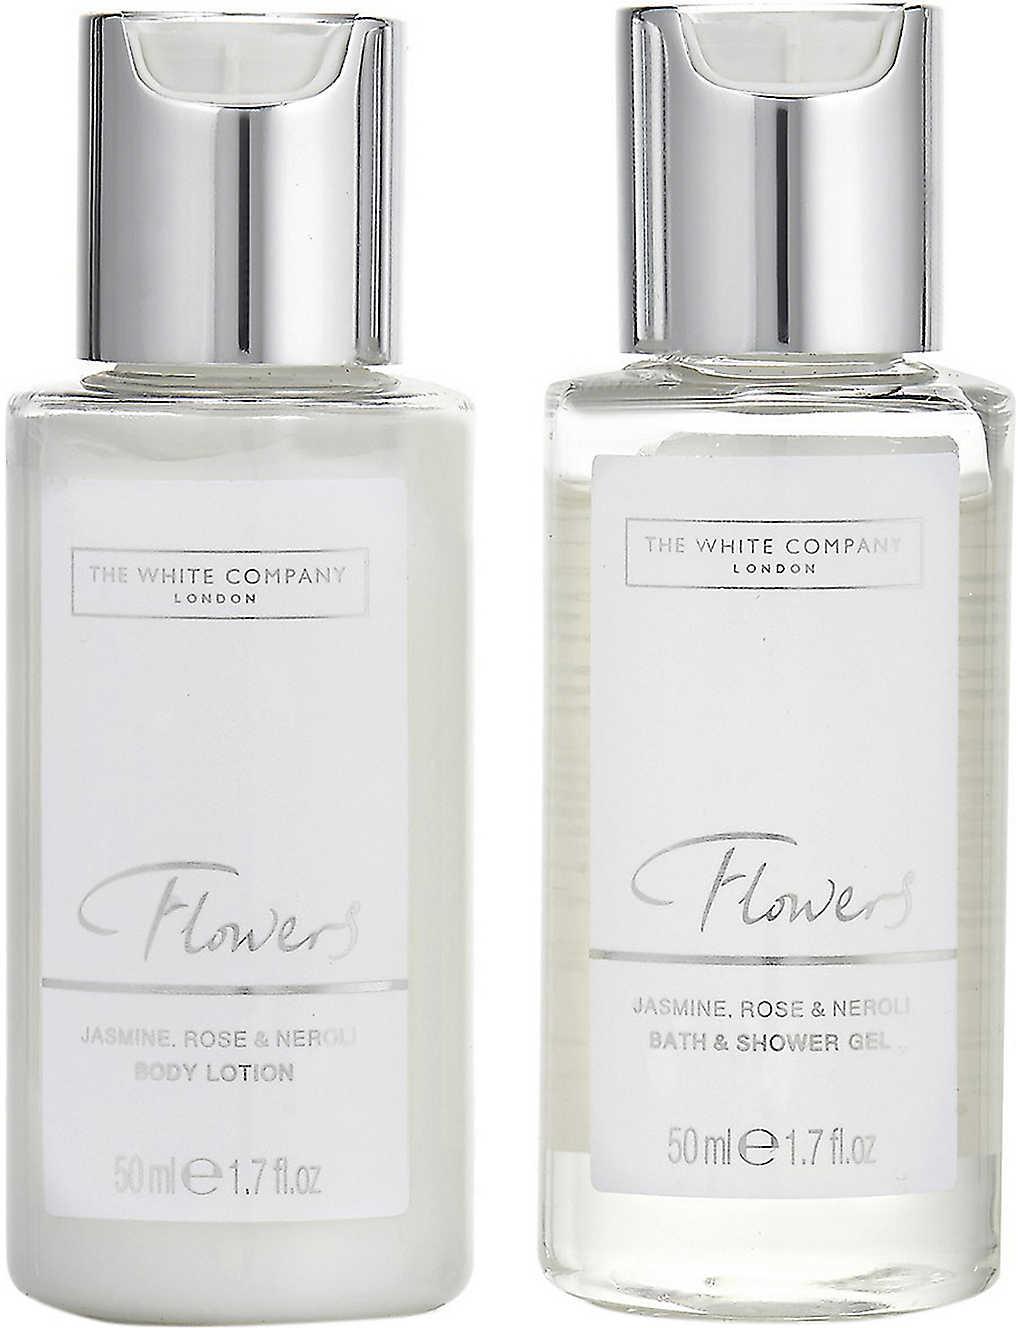 THE WHITE COMPANY - Flowers bath & body miniatures